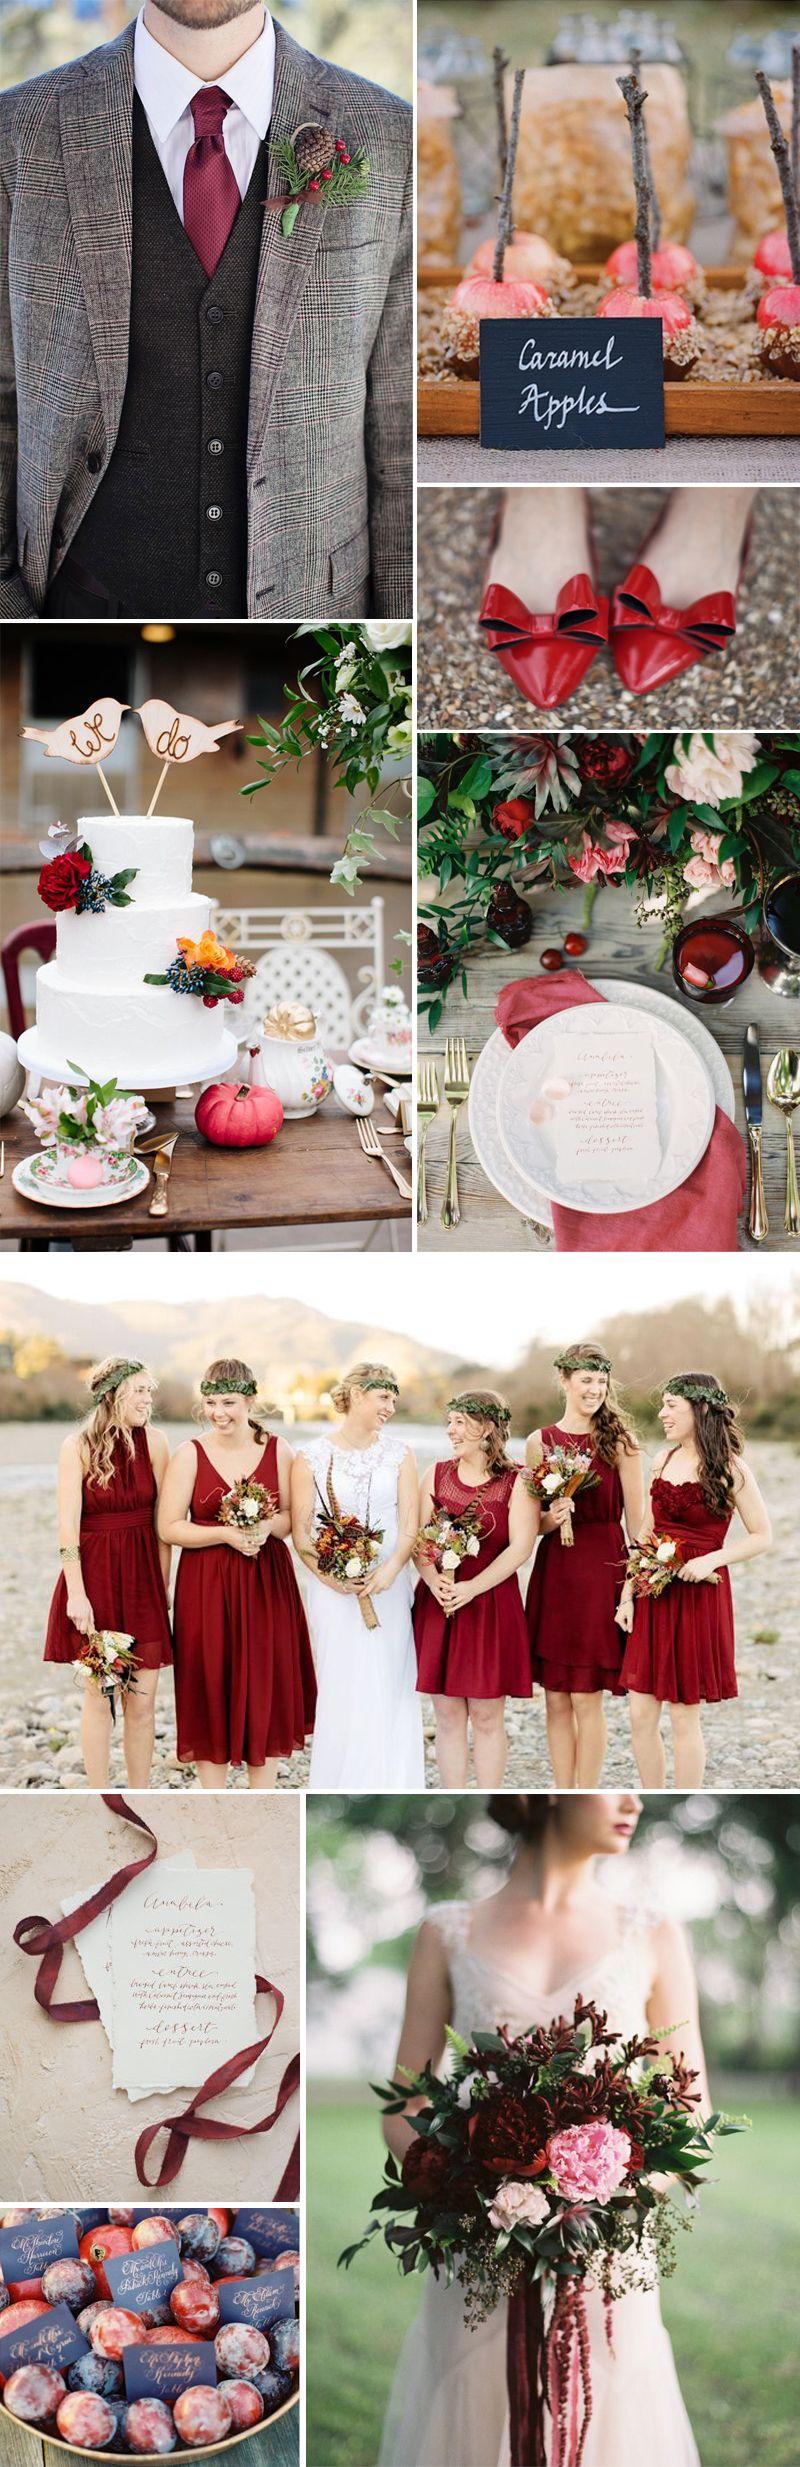 Fall wedding decor 2018  Mesmerizing Fall Wedding Ideas for  that You Will Love